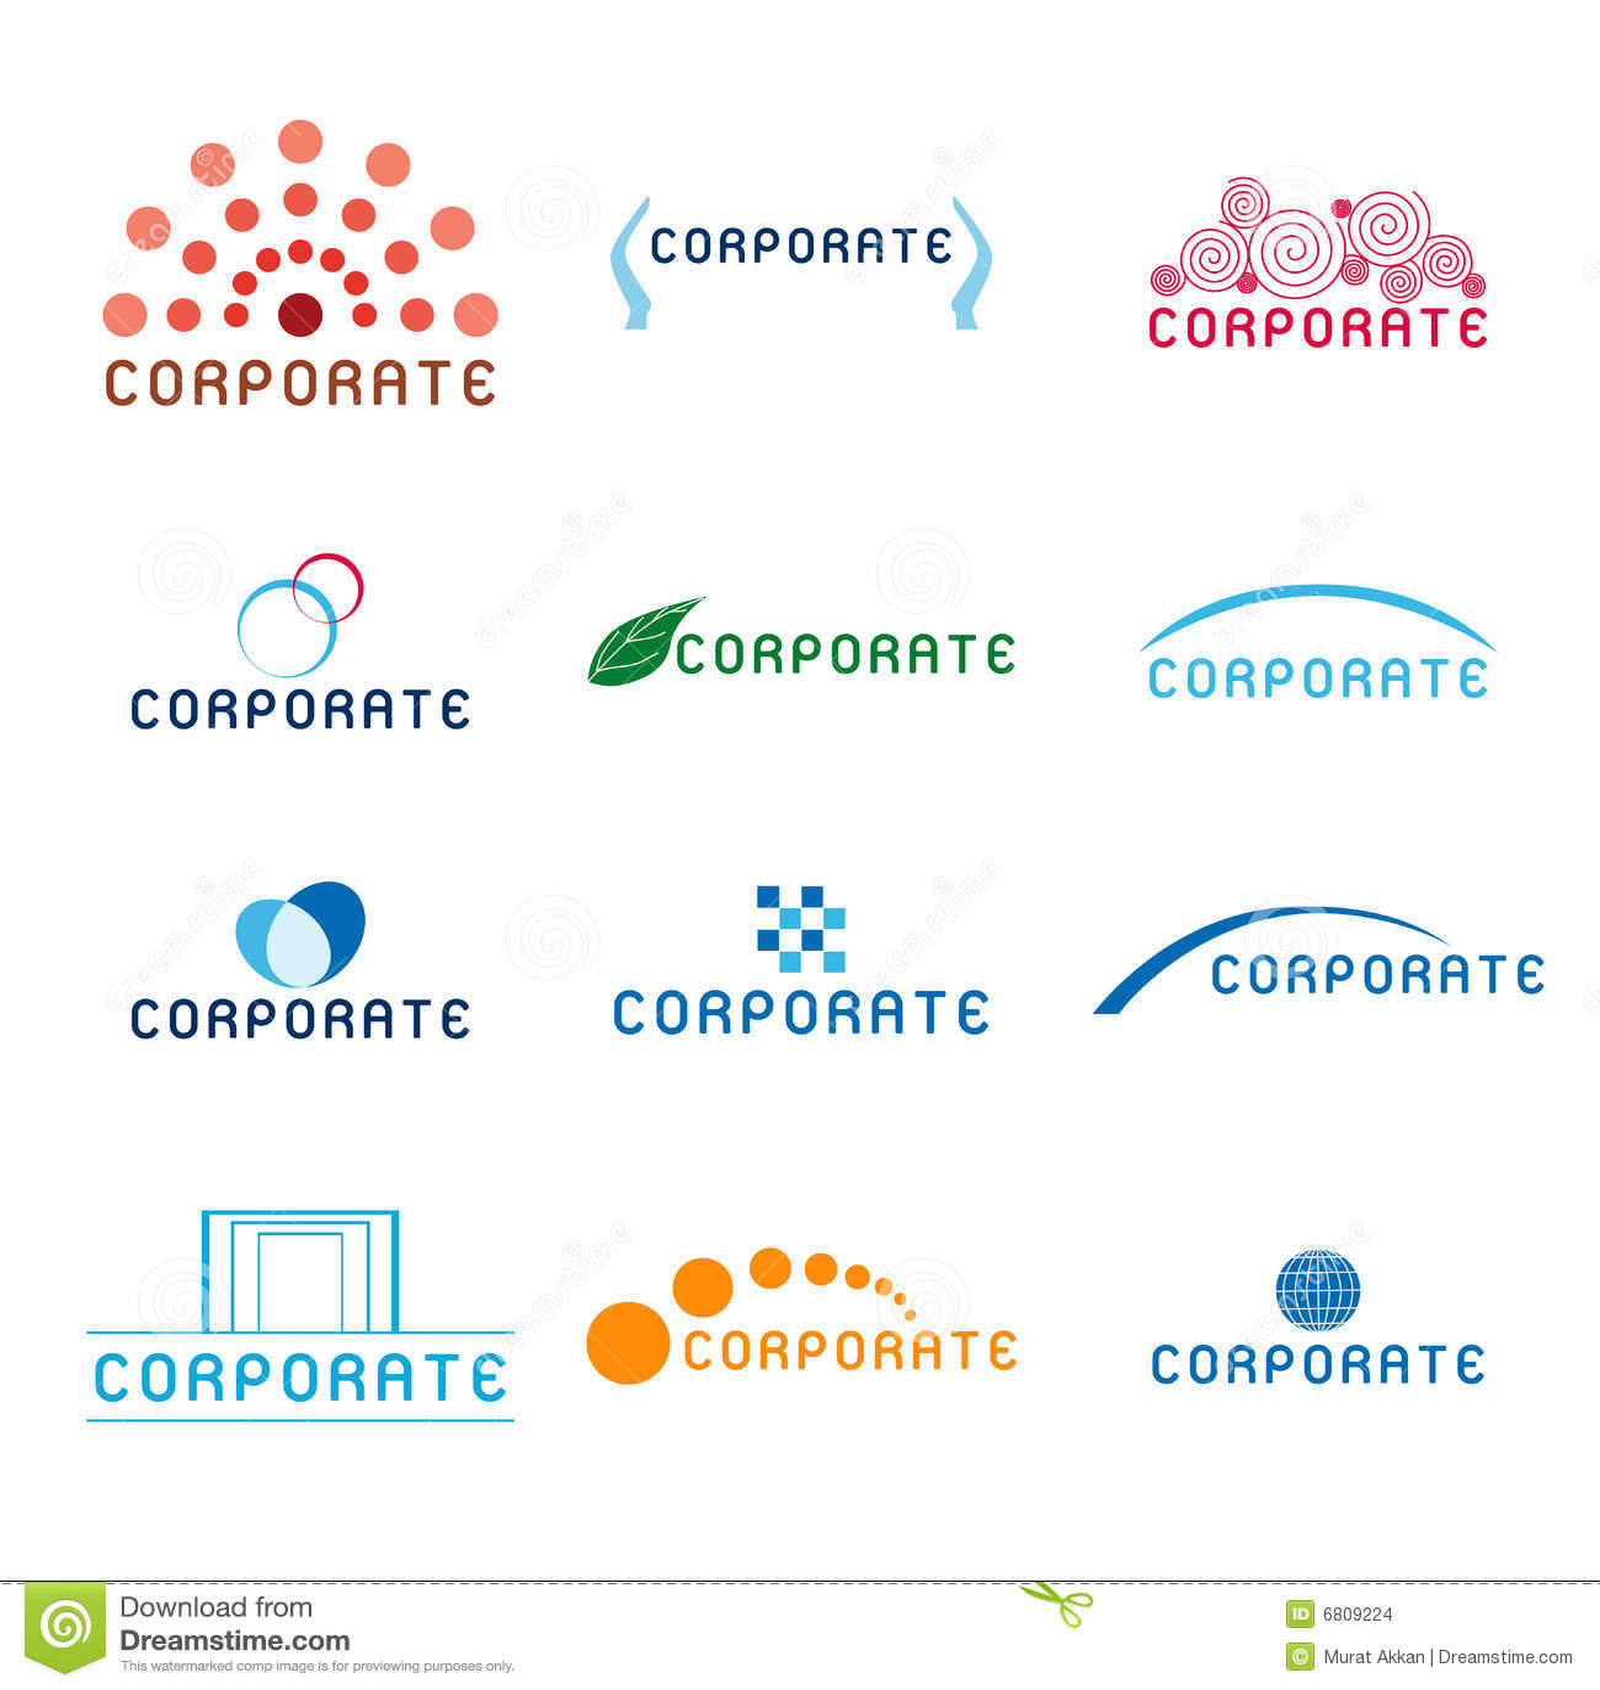 Marchi corporativi